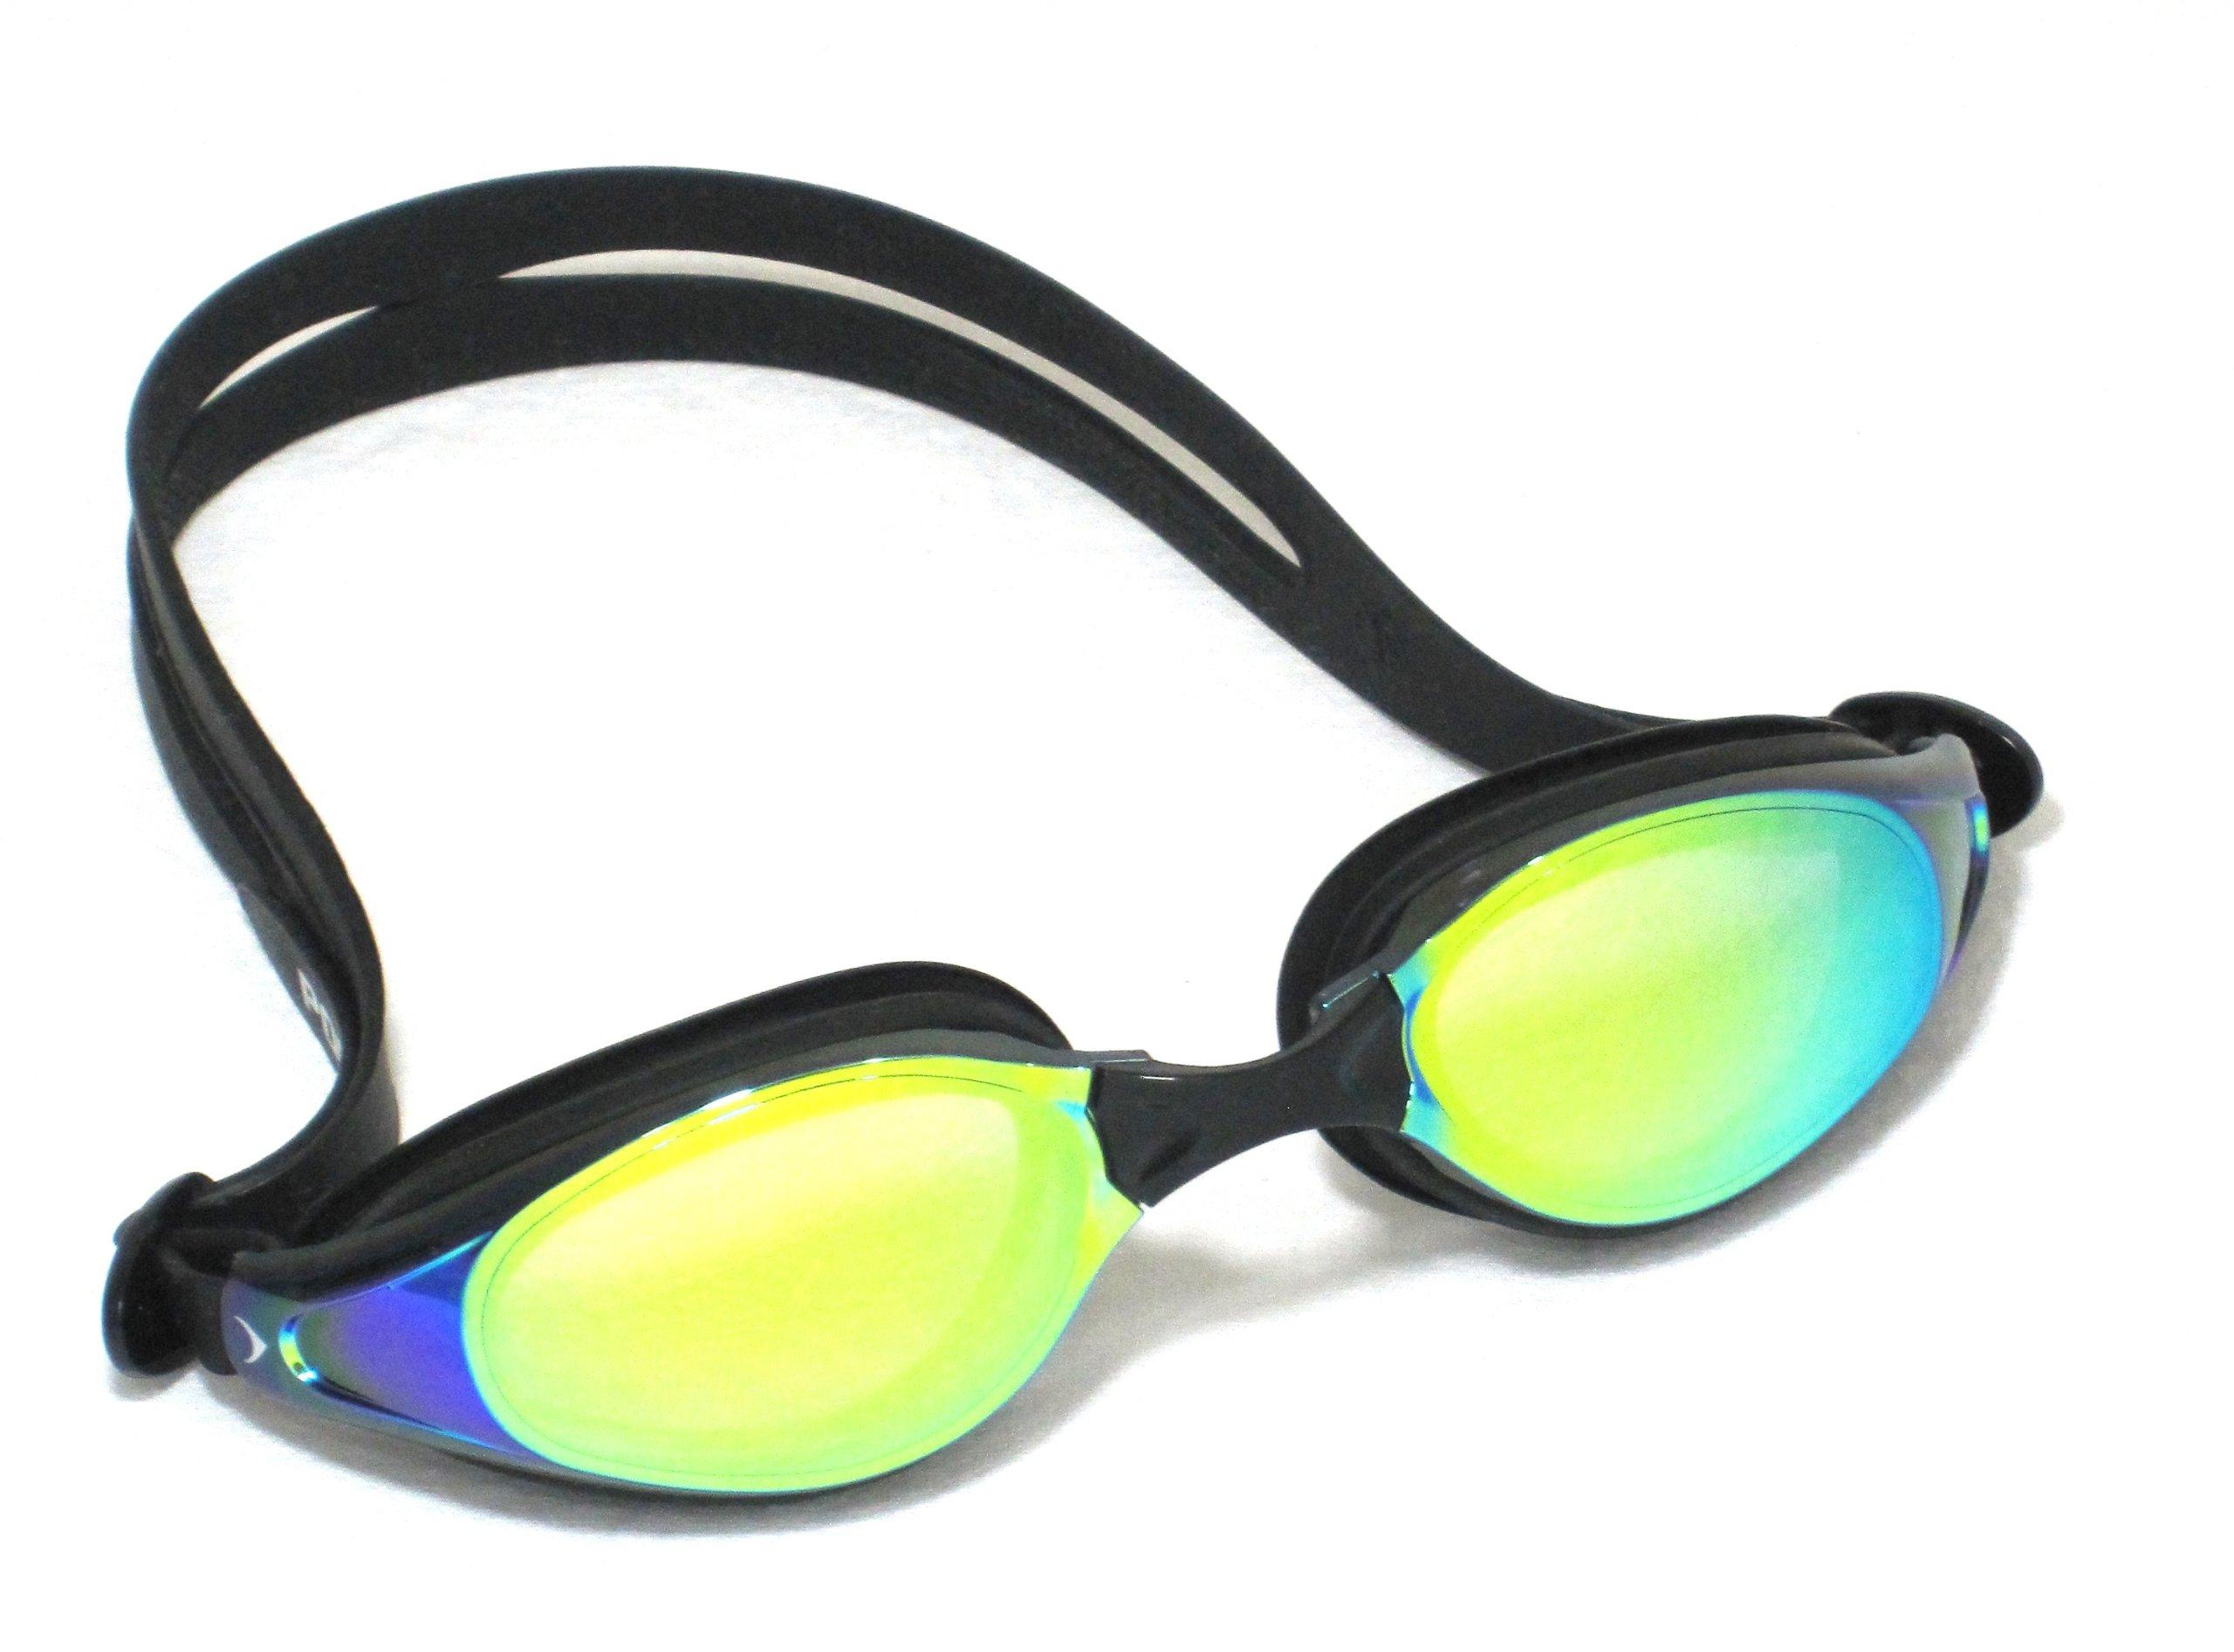 Portivo Hawkeyes Distance Swim Goggles with Reflex Mirror and Anti-Fog Coating